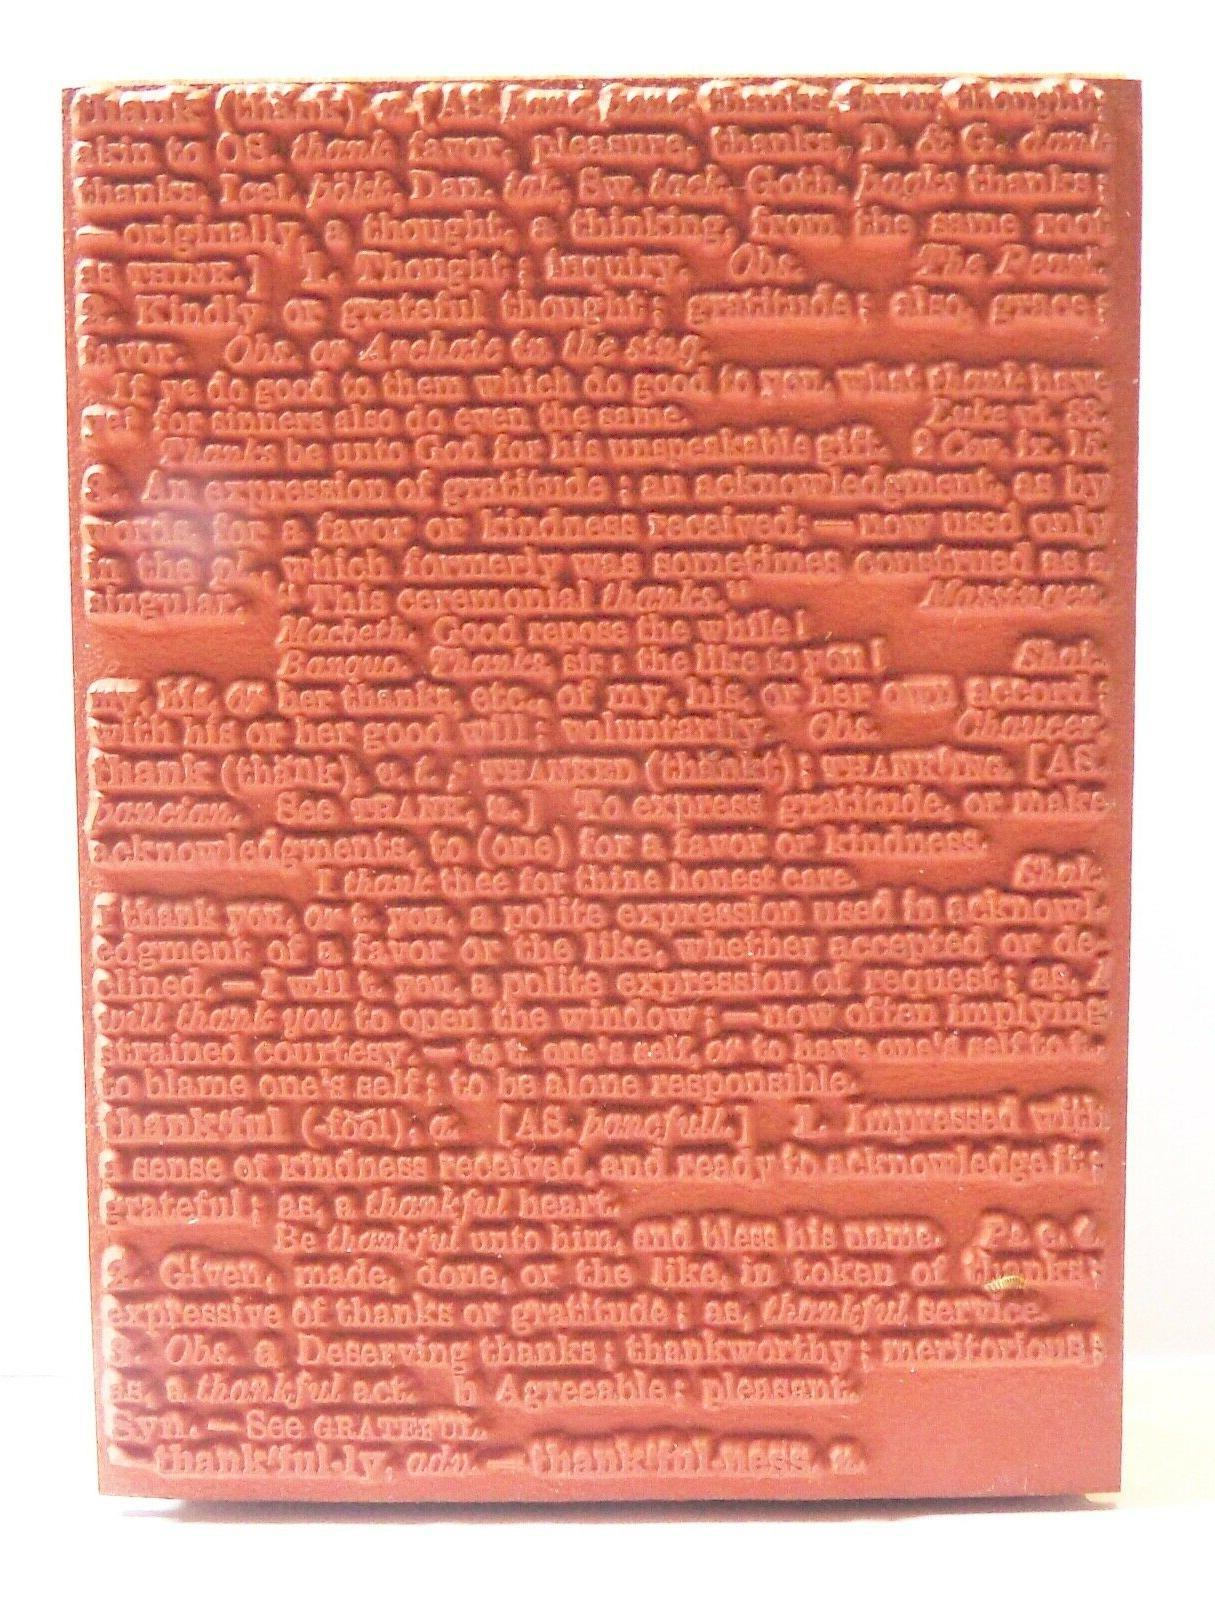 Hero Wood Rubber G2679 Unused